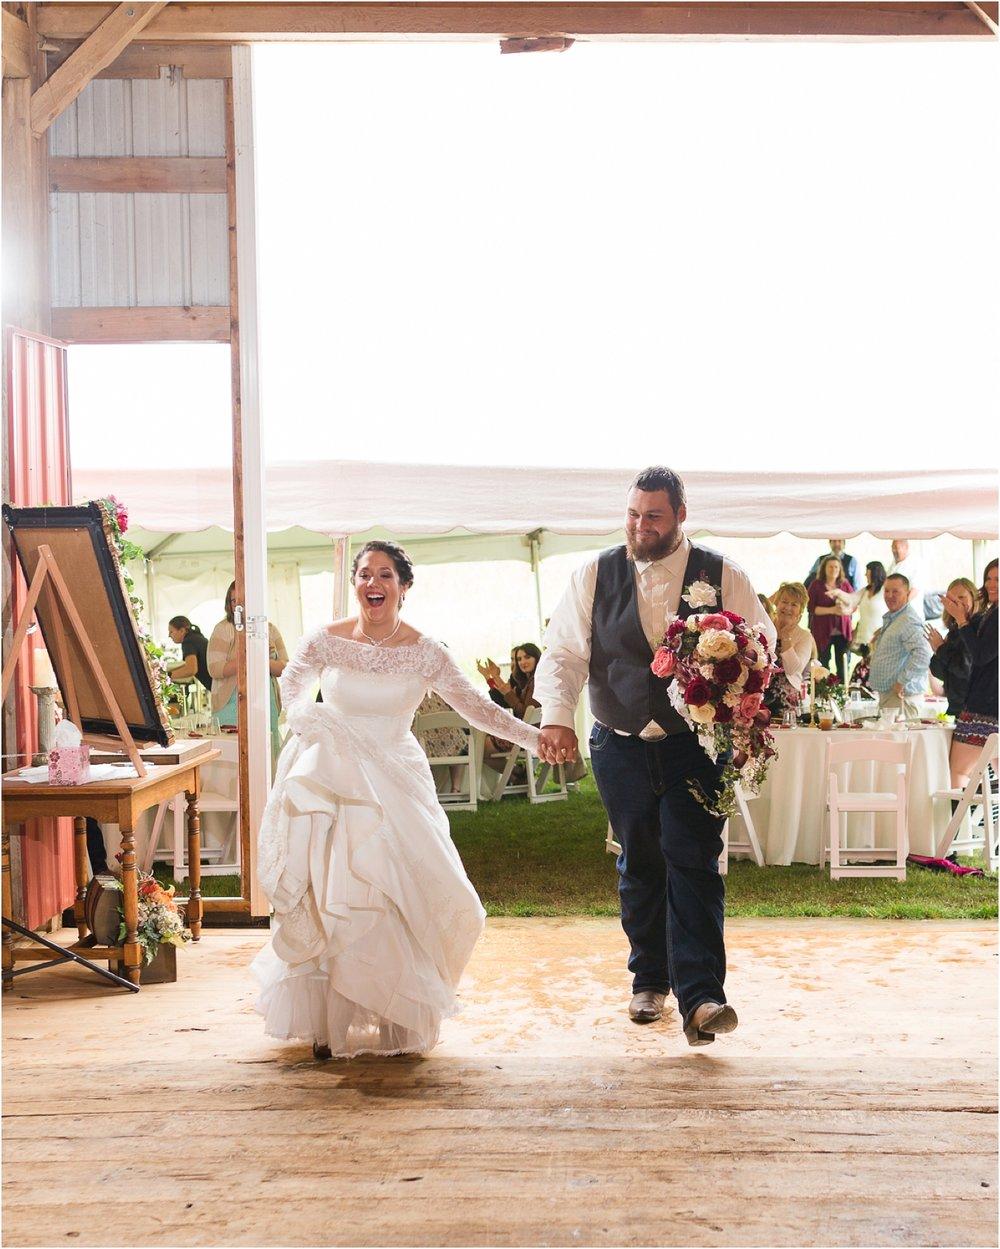 Maryland-Barn-Wedding-Photos-60.jpg